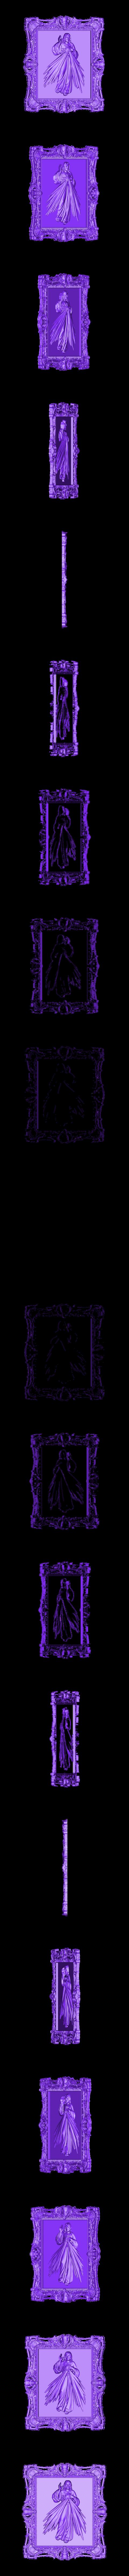 389.stl Download free STL file jesus christ cnc frame art • 3D printable template, STLmodelforfree